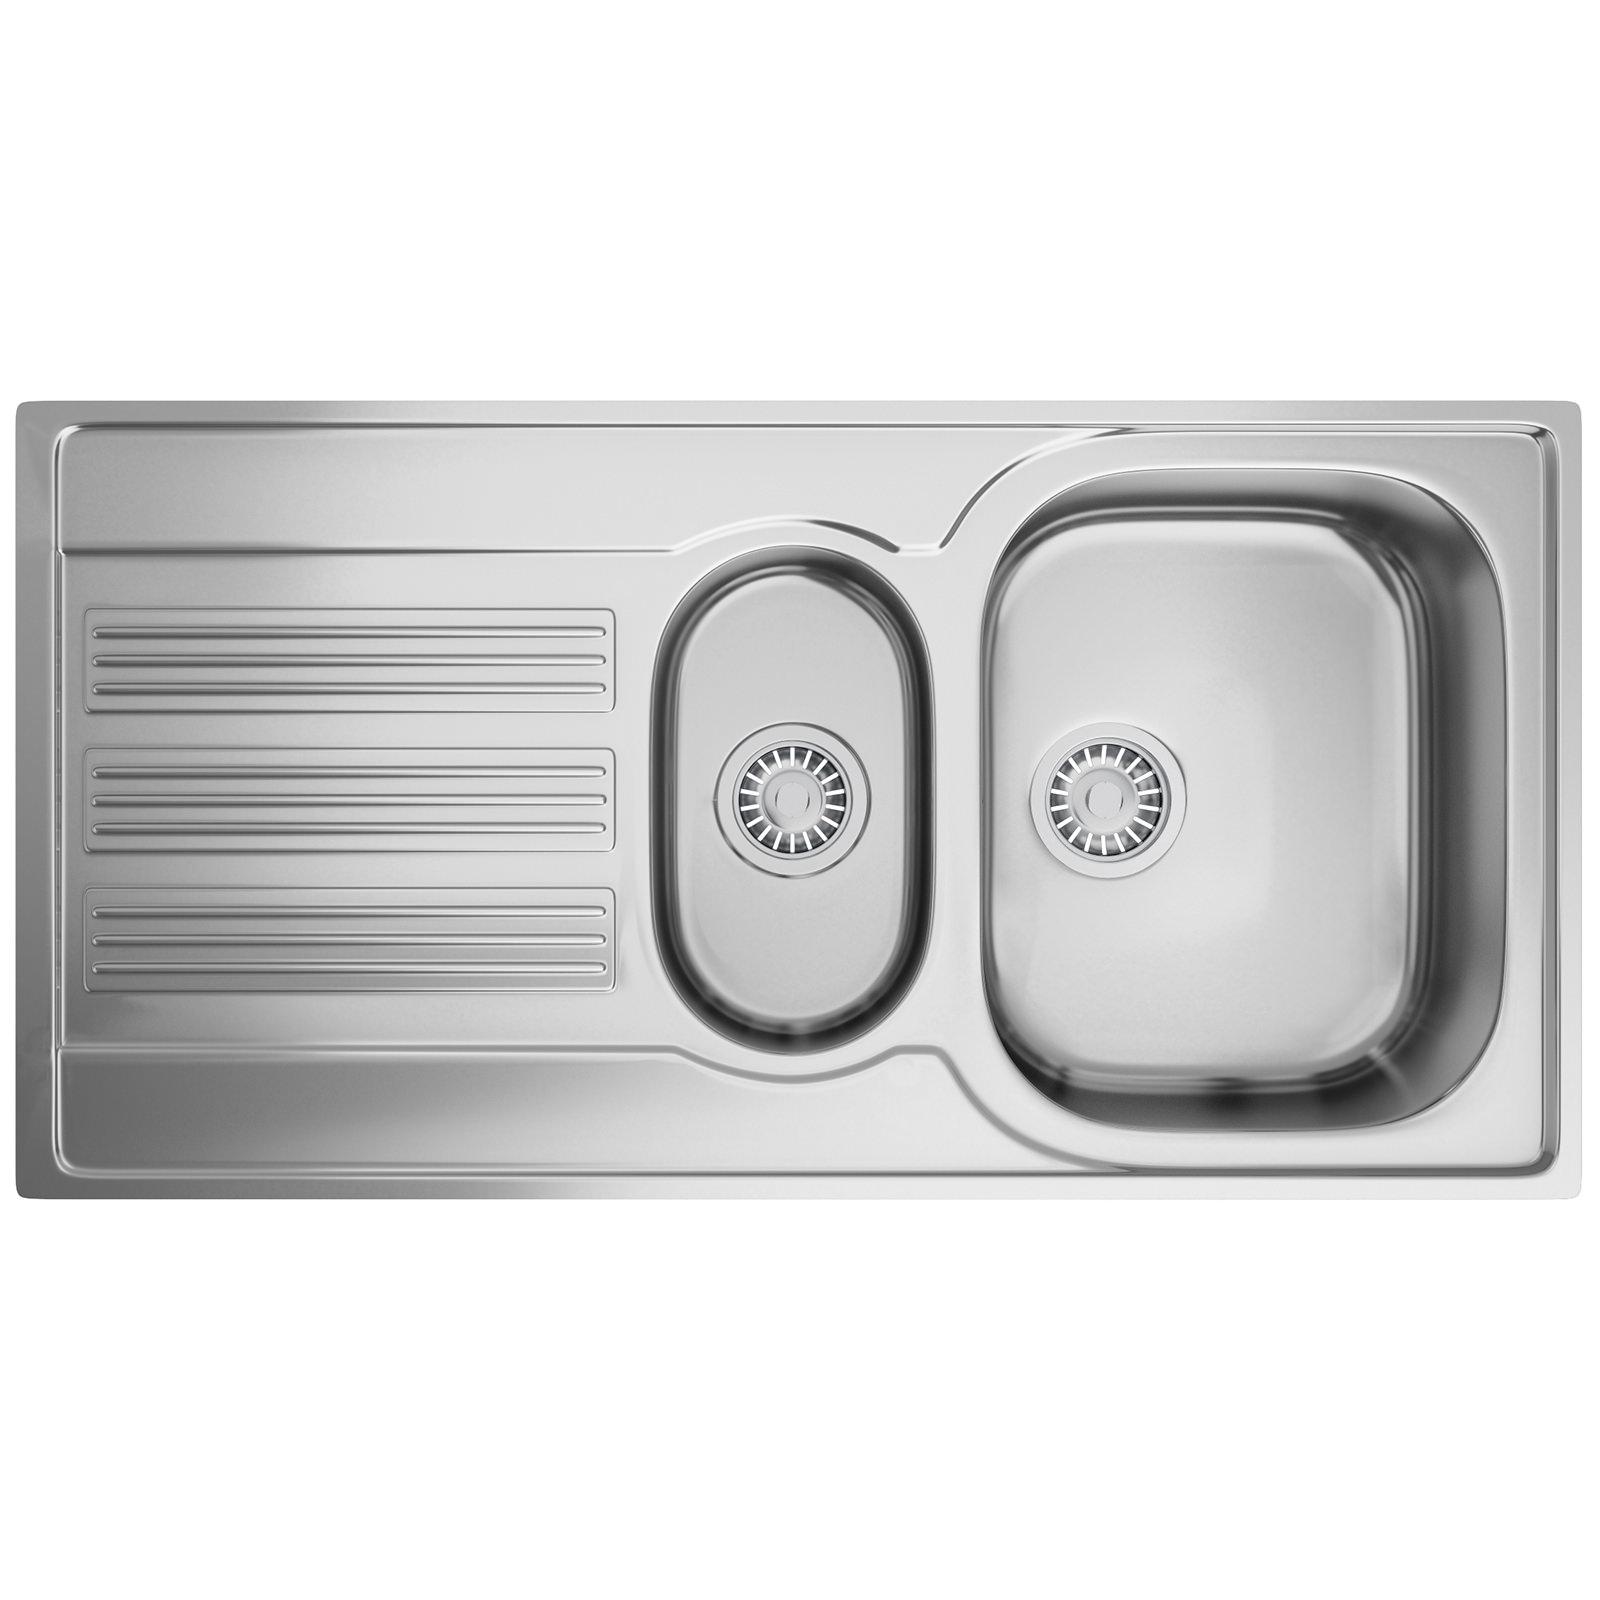 Franke Galileo GOX 651 Stainless Steel 1 5 Bowl Kitchen Inset Sink